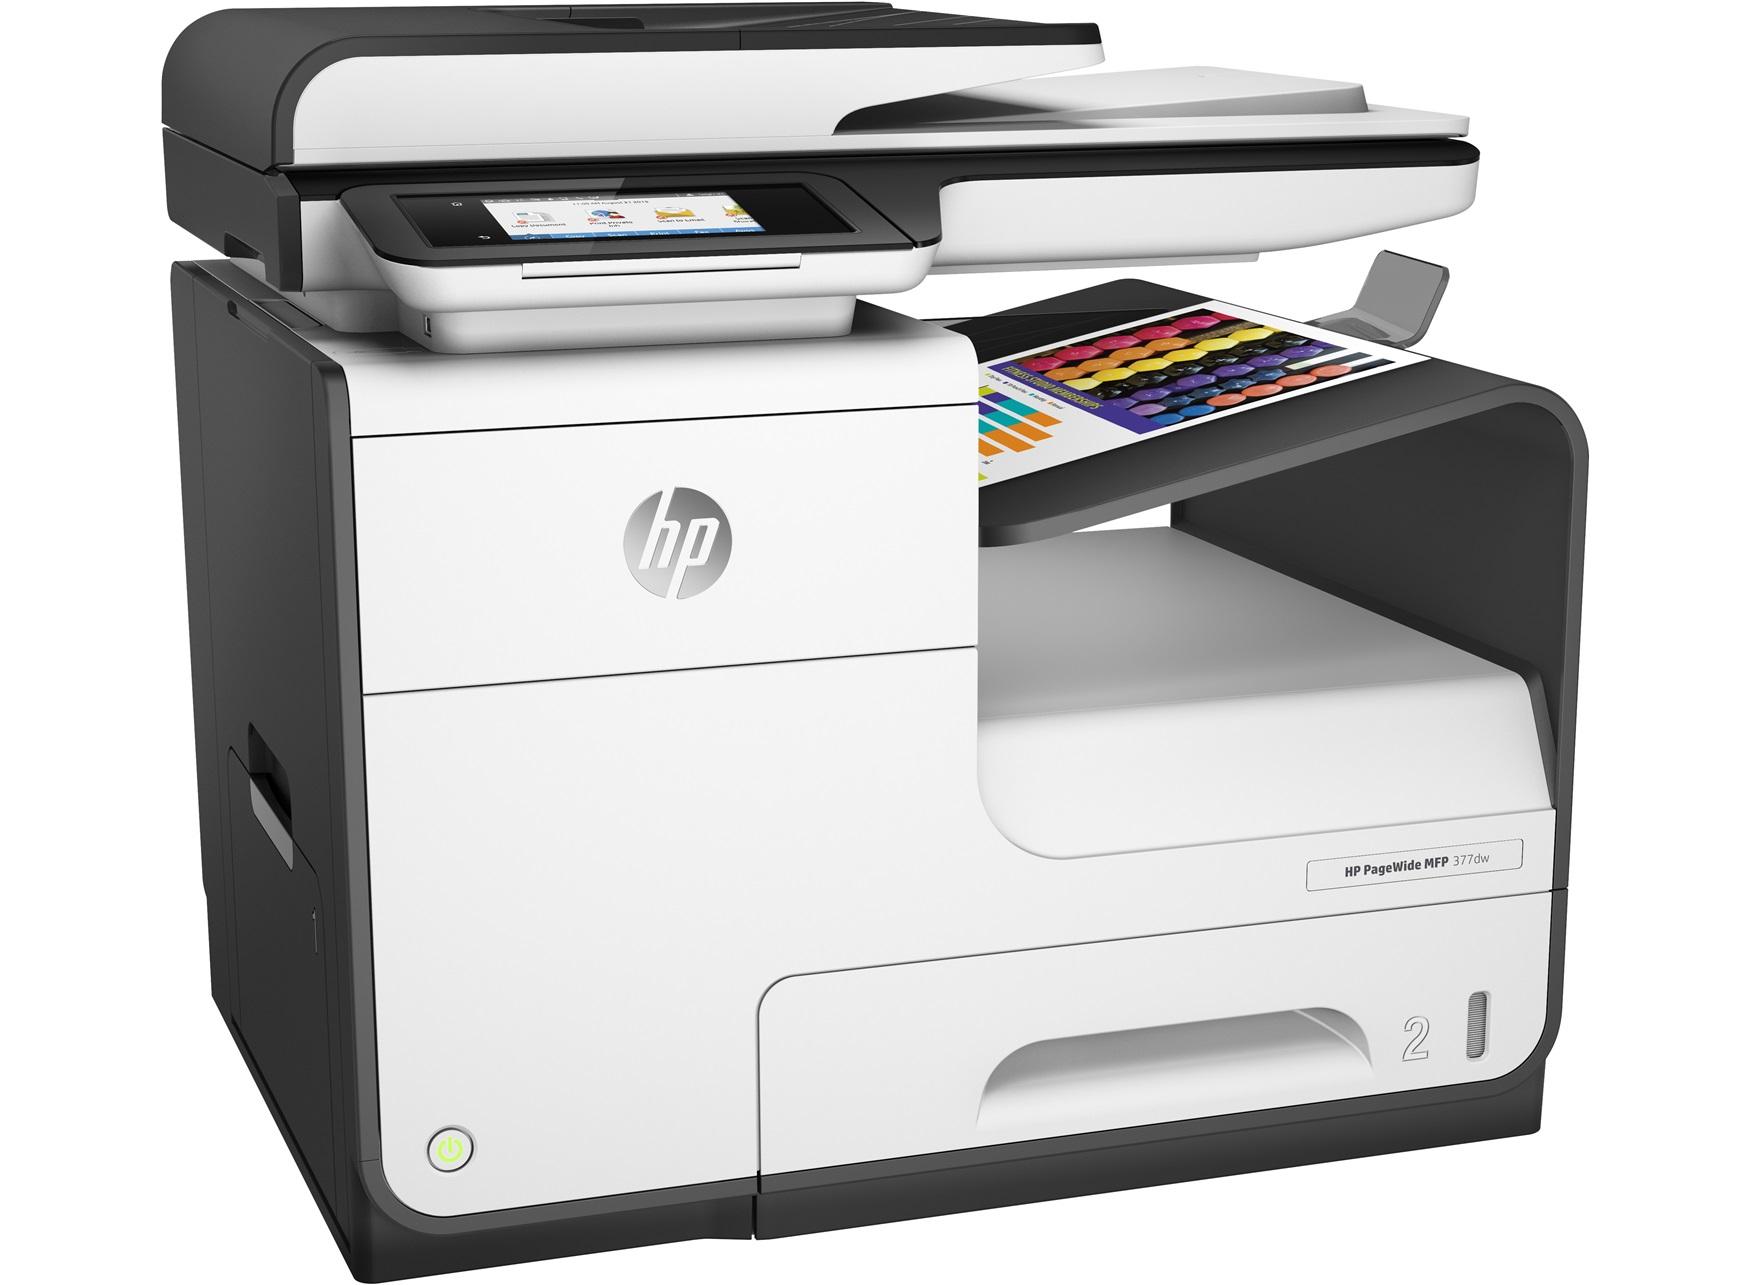 HP PageWide zakelijke printer